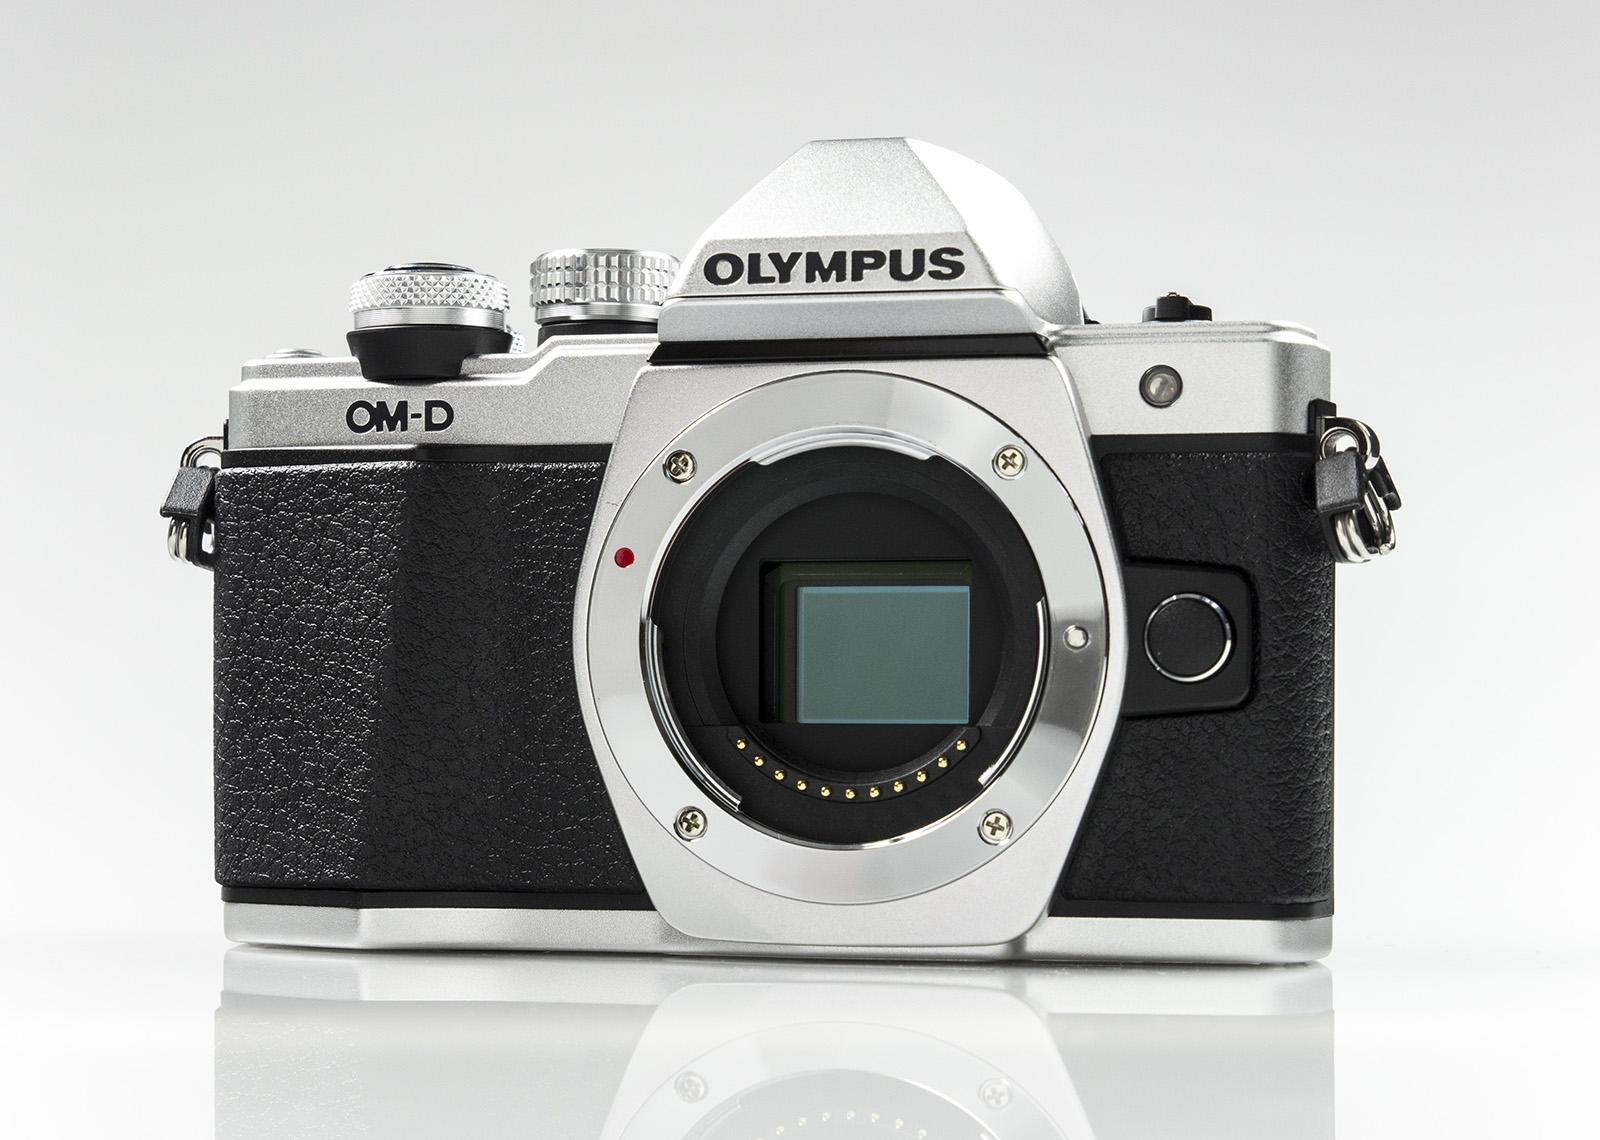 olympus om-d e-m10 mark ii c